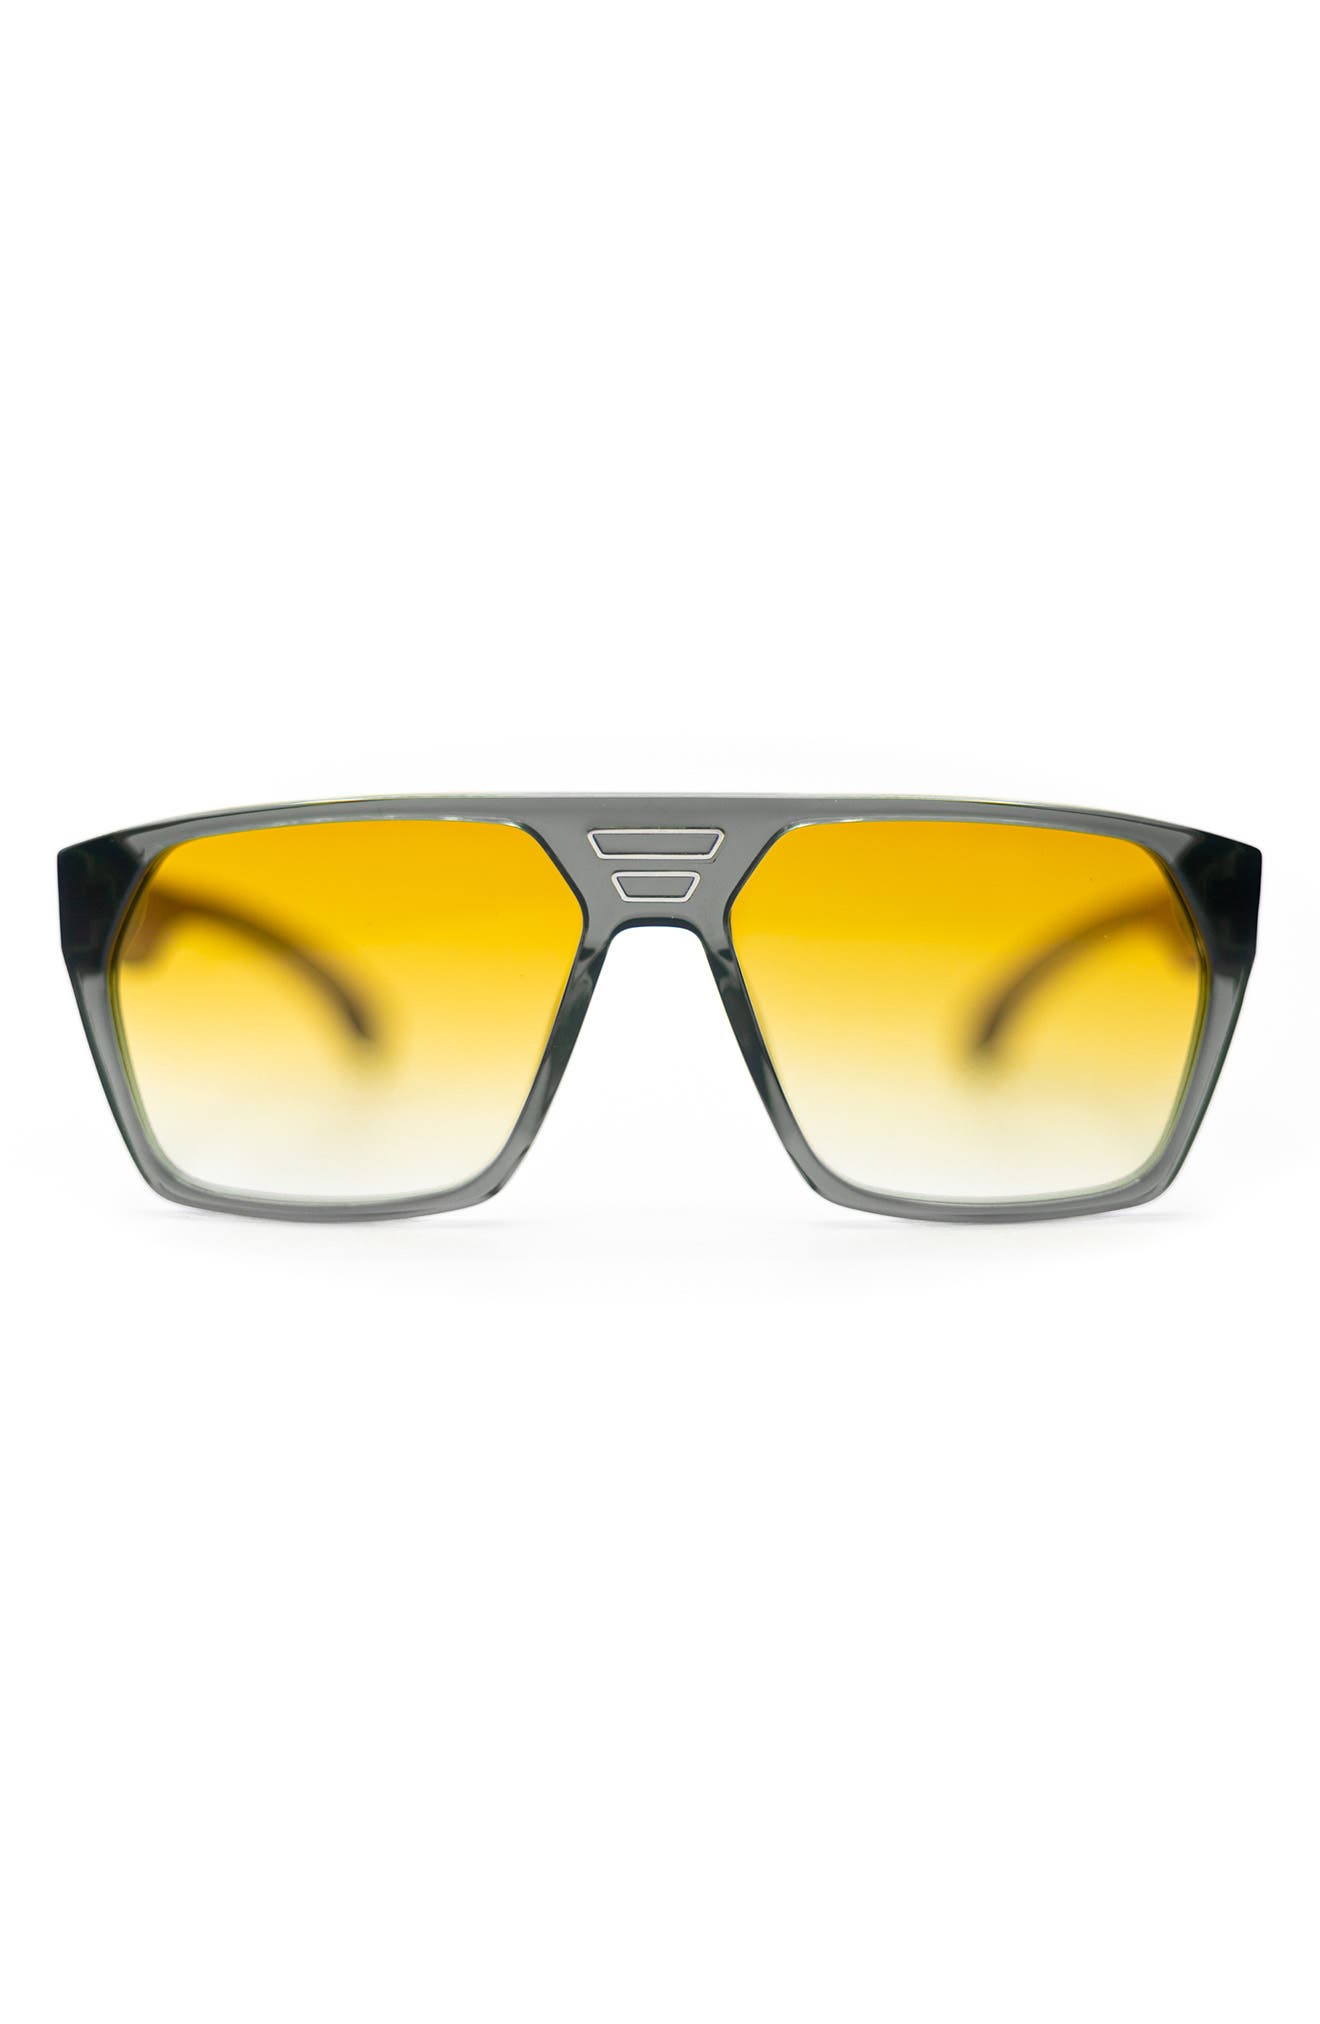 Voyager 59mm Gradient Rectangular Blue Light Blocking Sunglasses